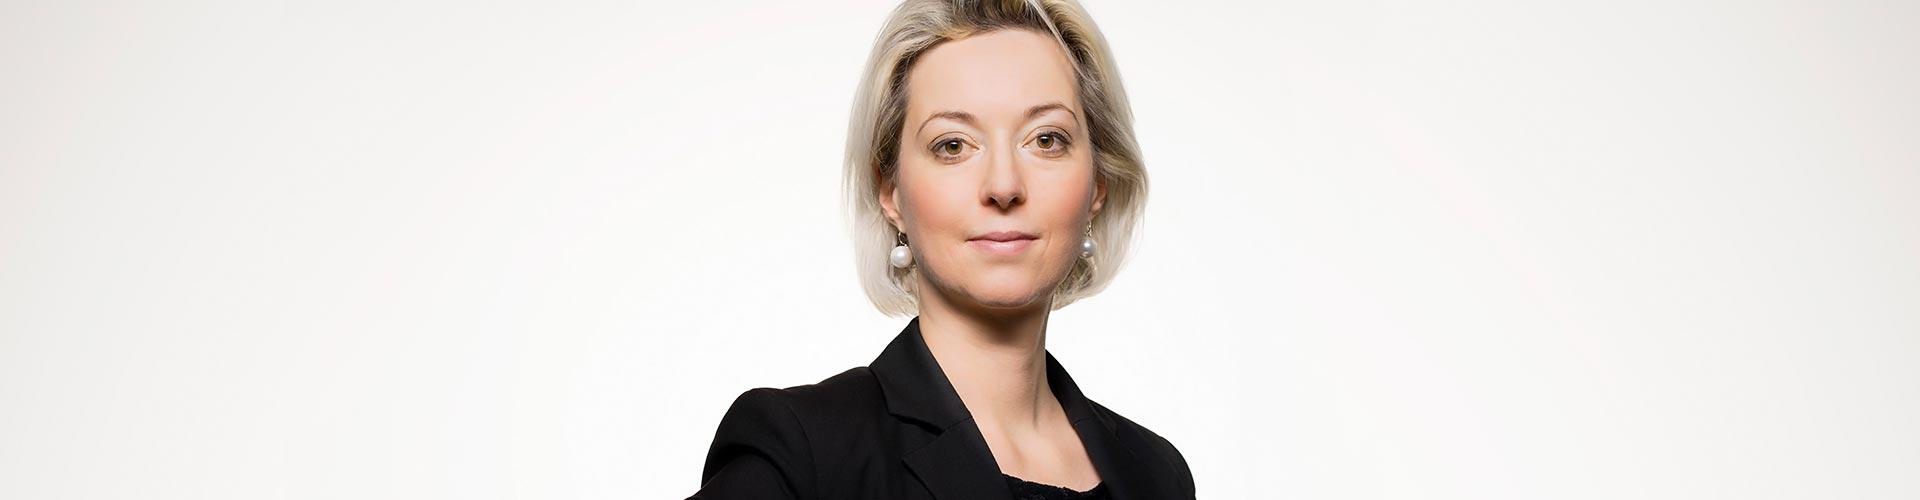 Rechtsanwältin Dr. Christina Schmidt